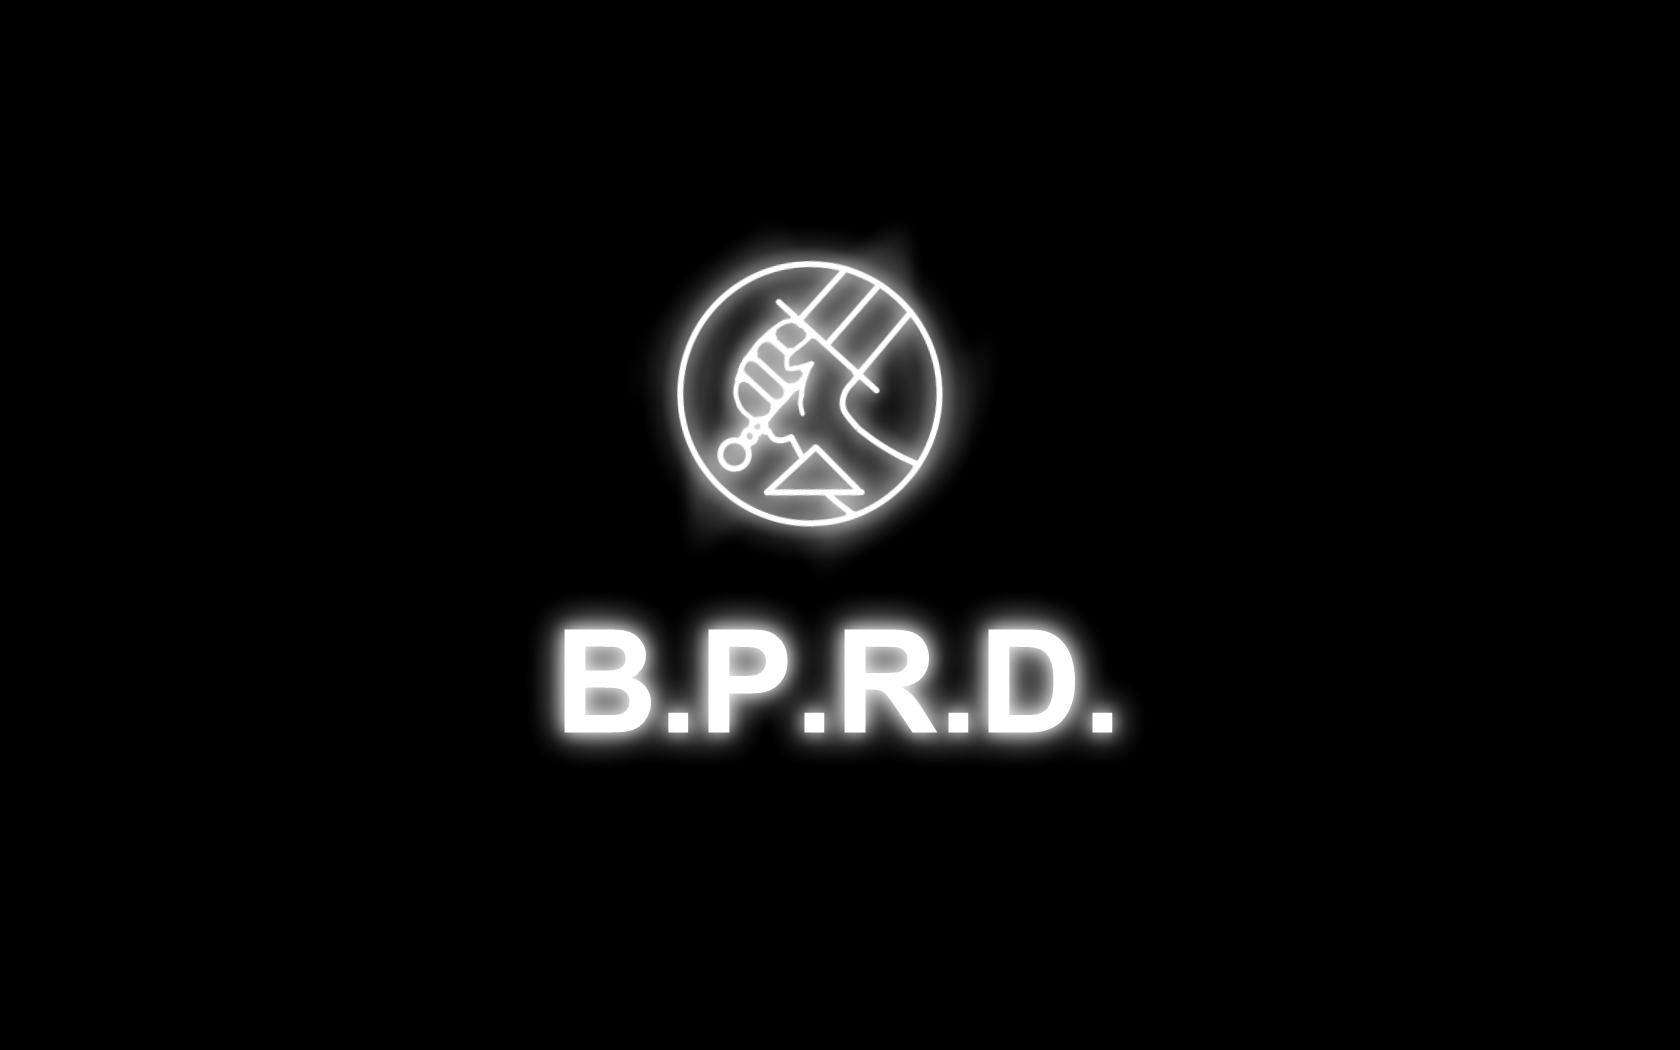 B.P.R.D. logo hd blur | B.P.R.D. | Pinterest | Logos